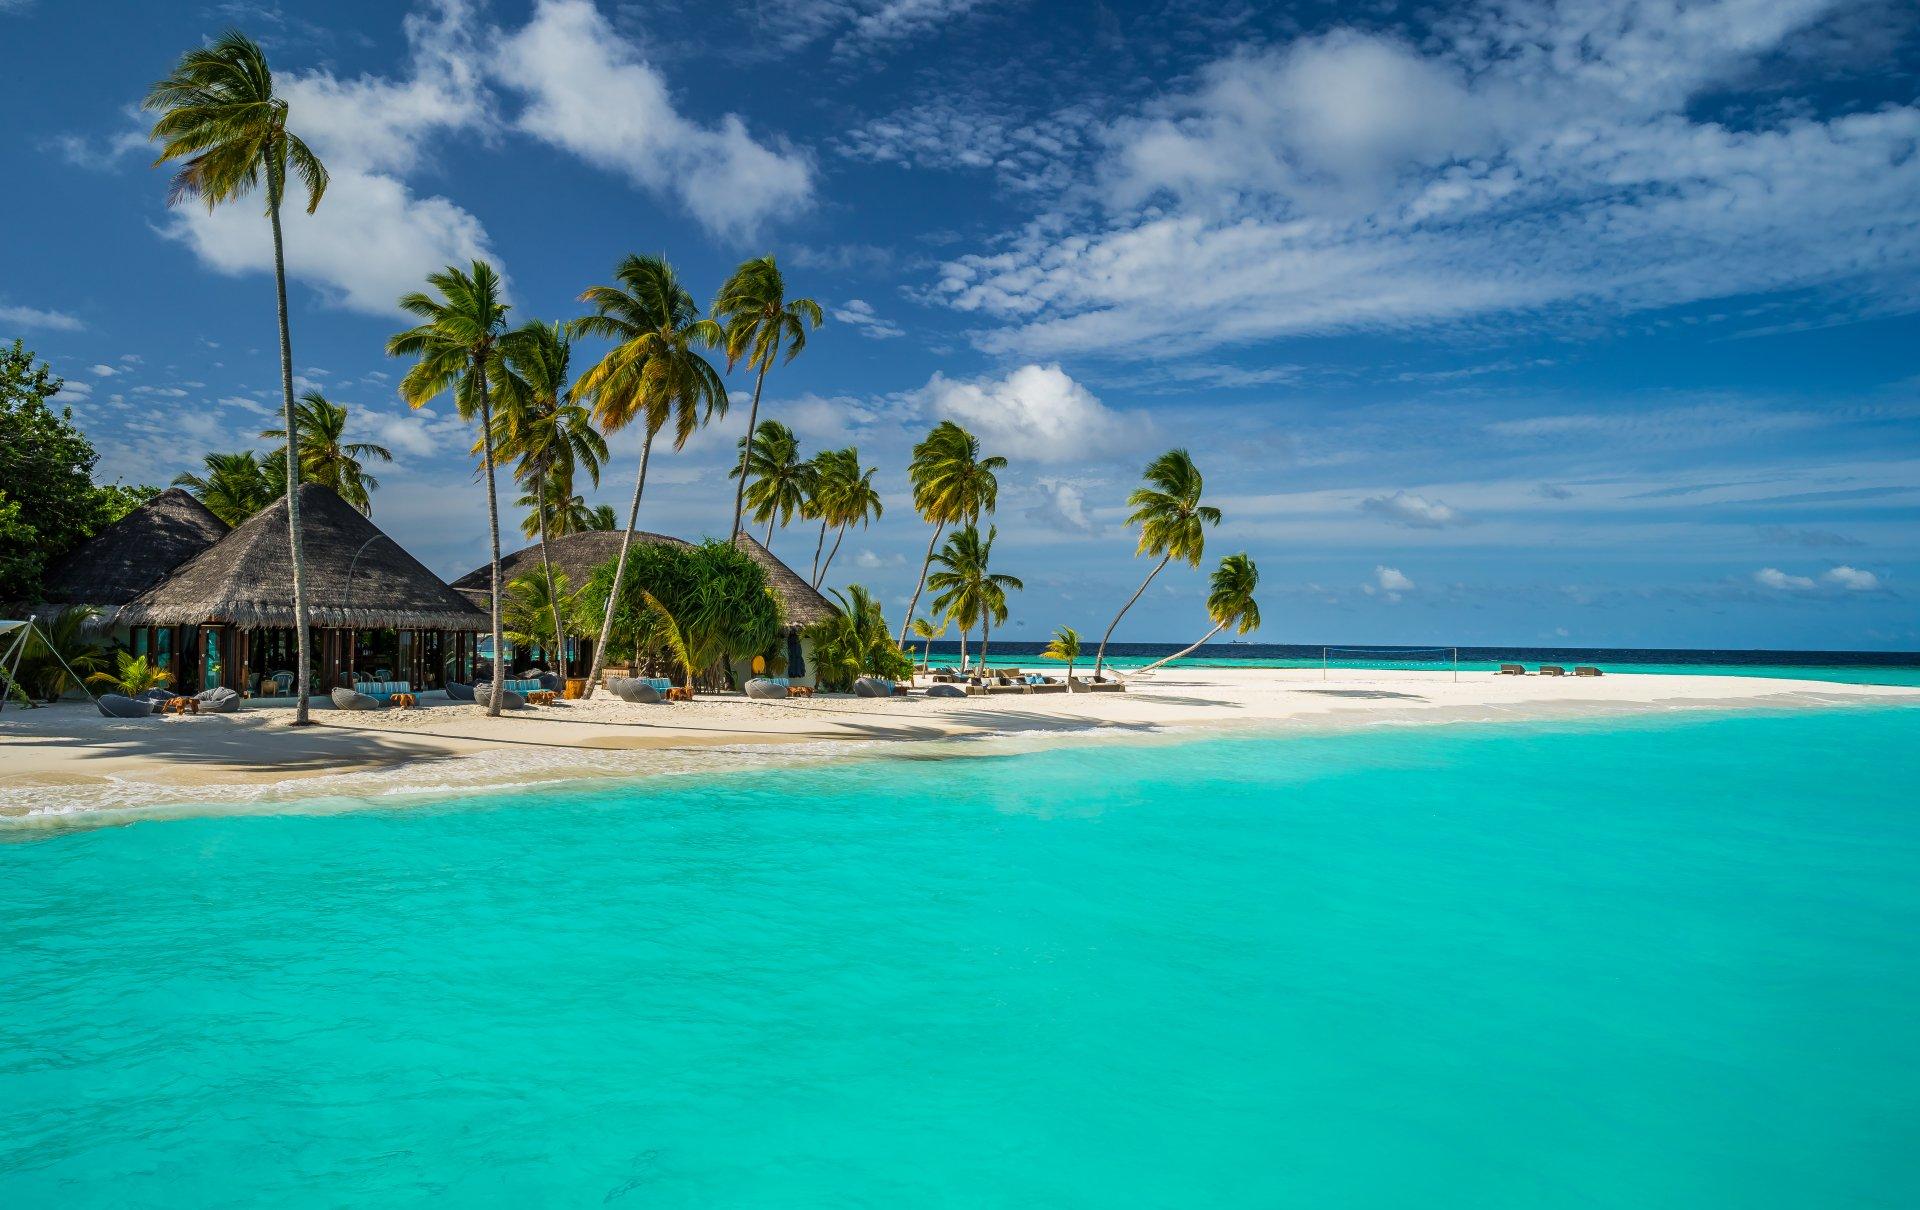 Photography - Tropical  Resort Sky Lagoon Sea Palm Tree Seaside Tropics Constance Halaveli Resort Maldives Wallpaper